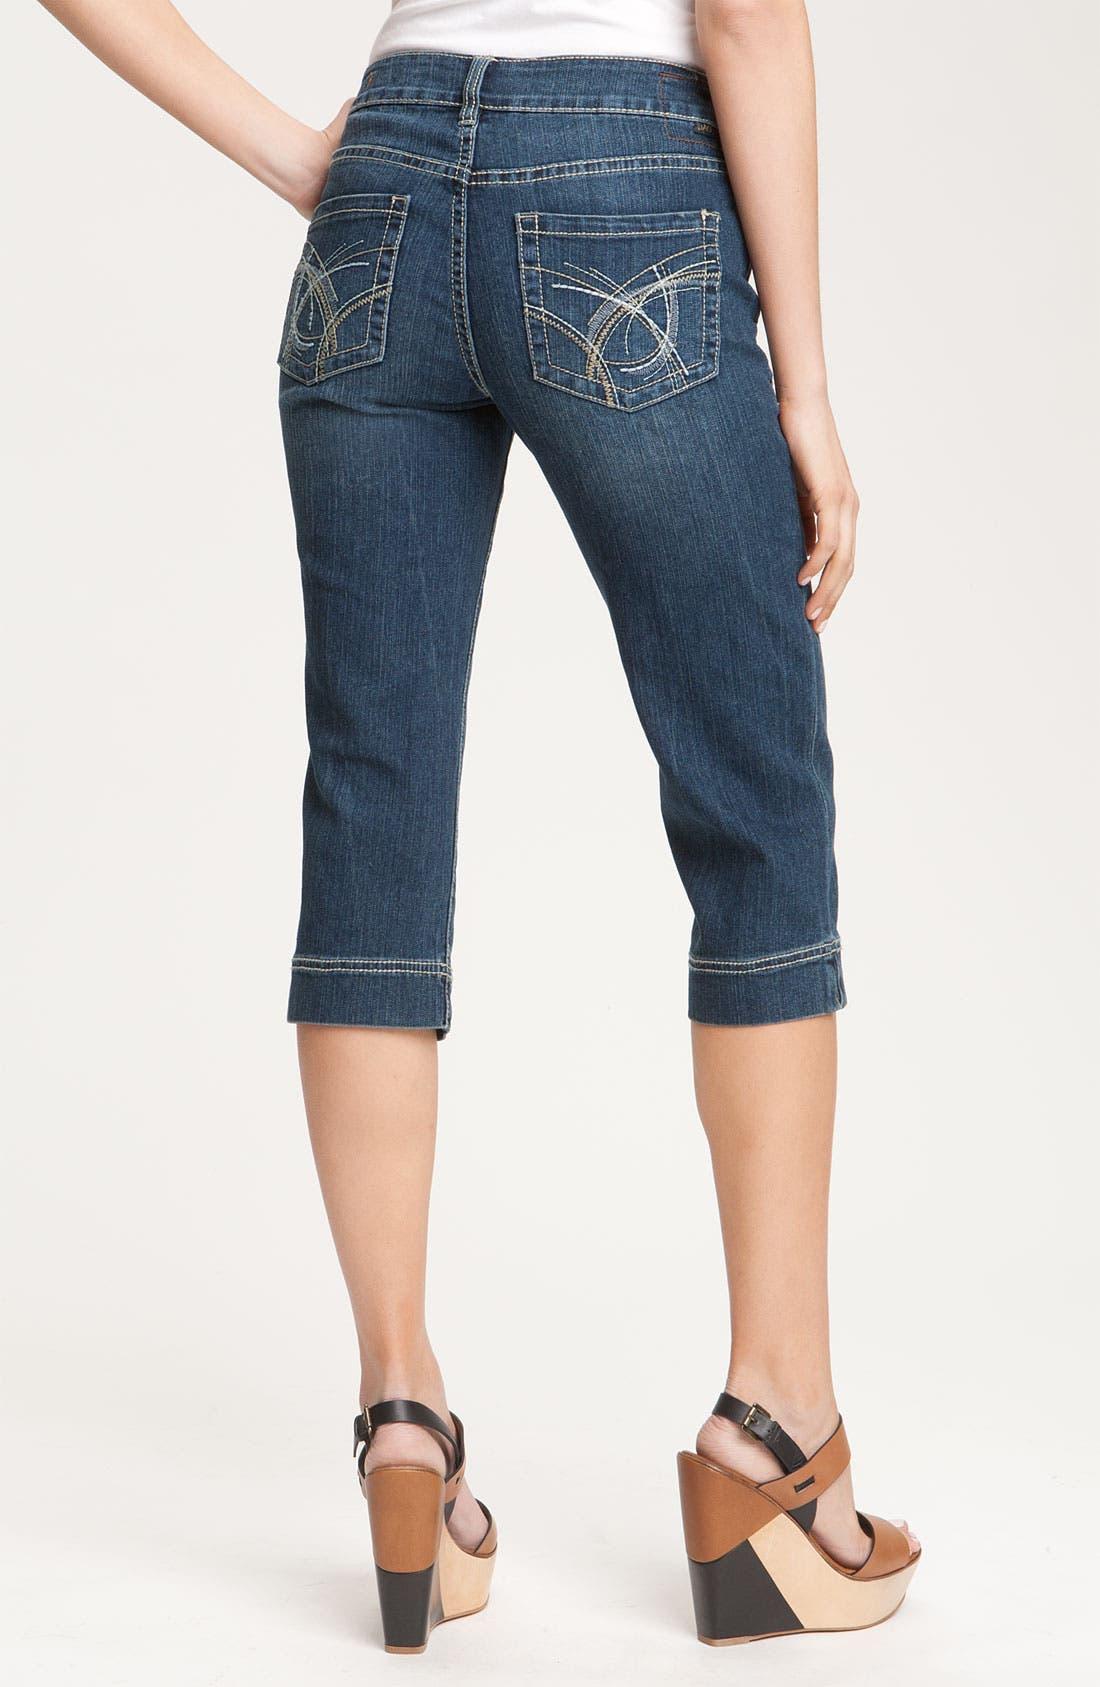 Main Image - Jag Jeans 'Selma' Crop Jeans (Petite)